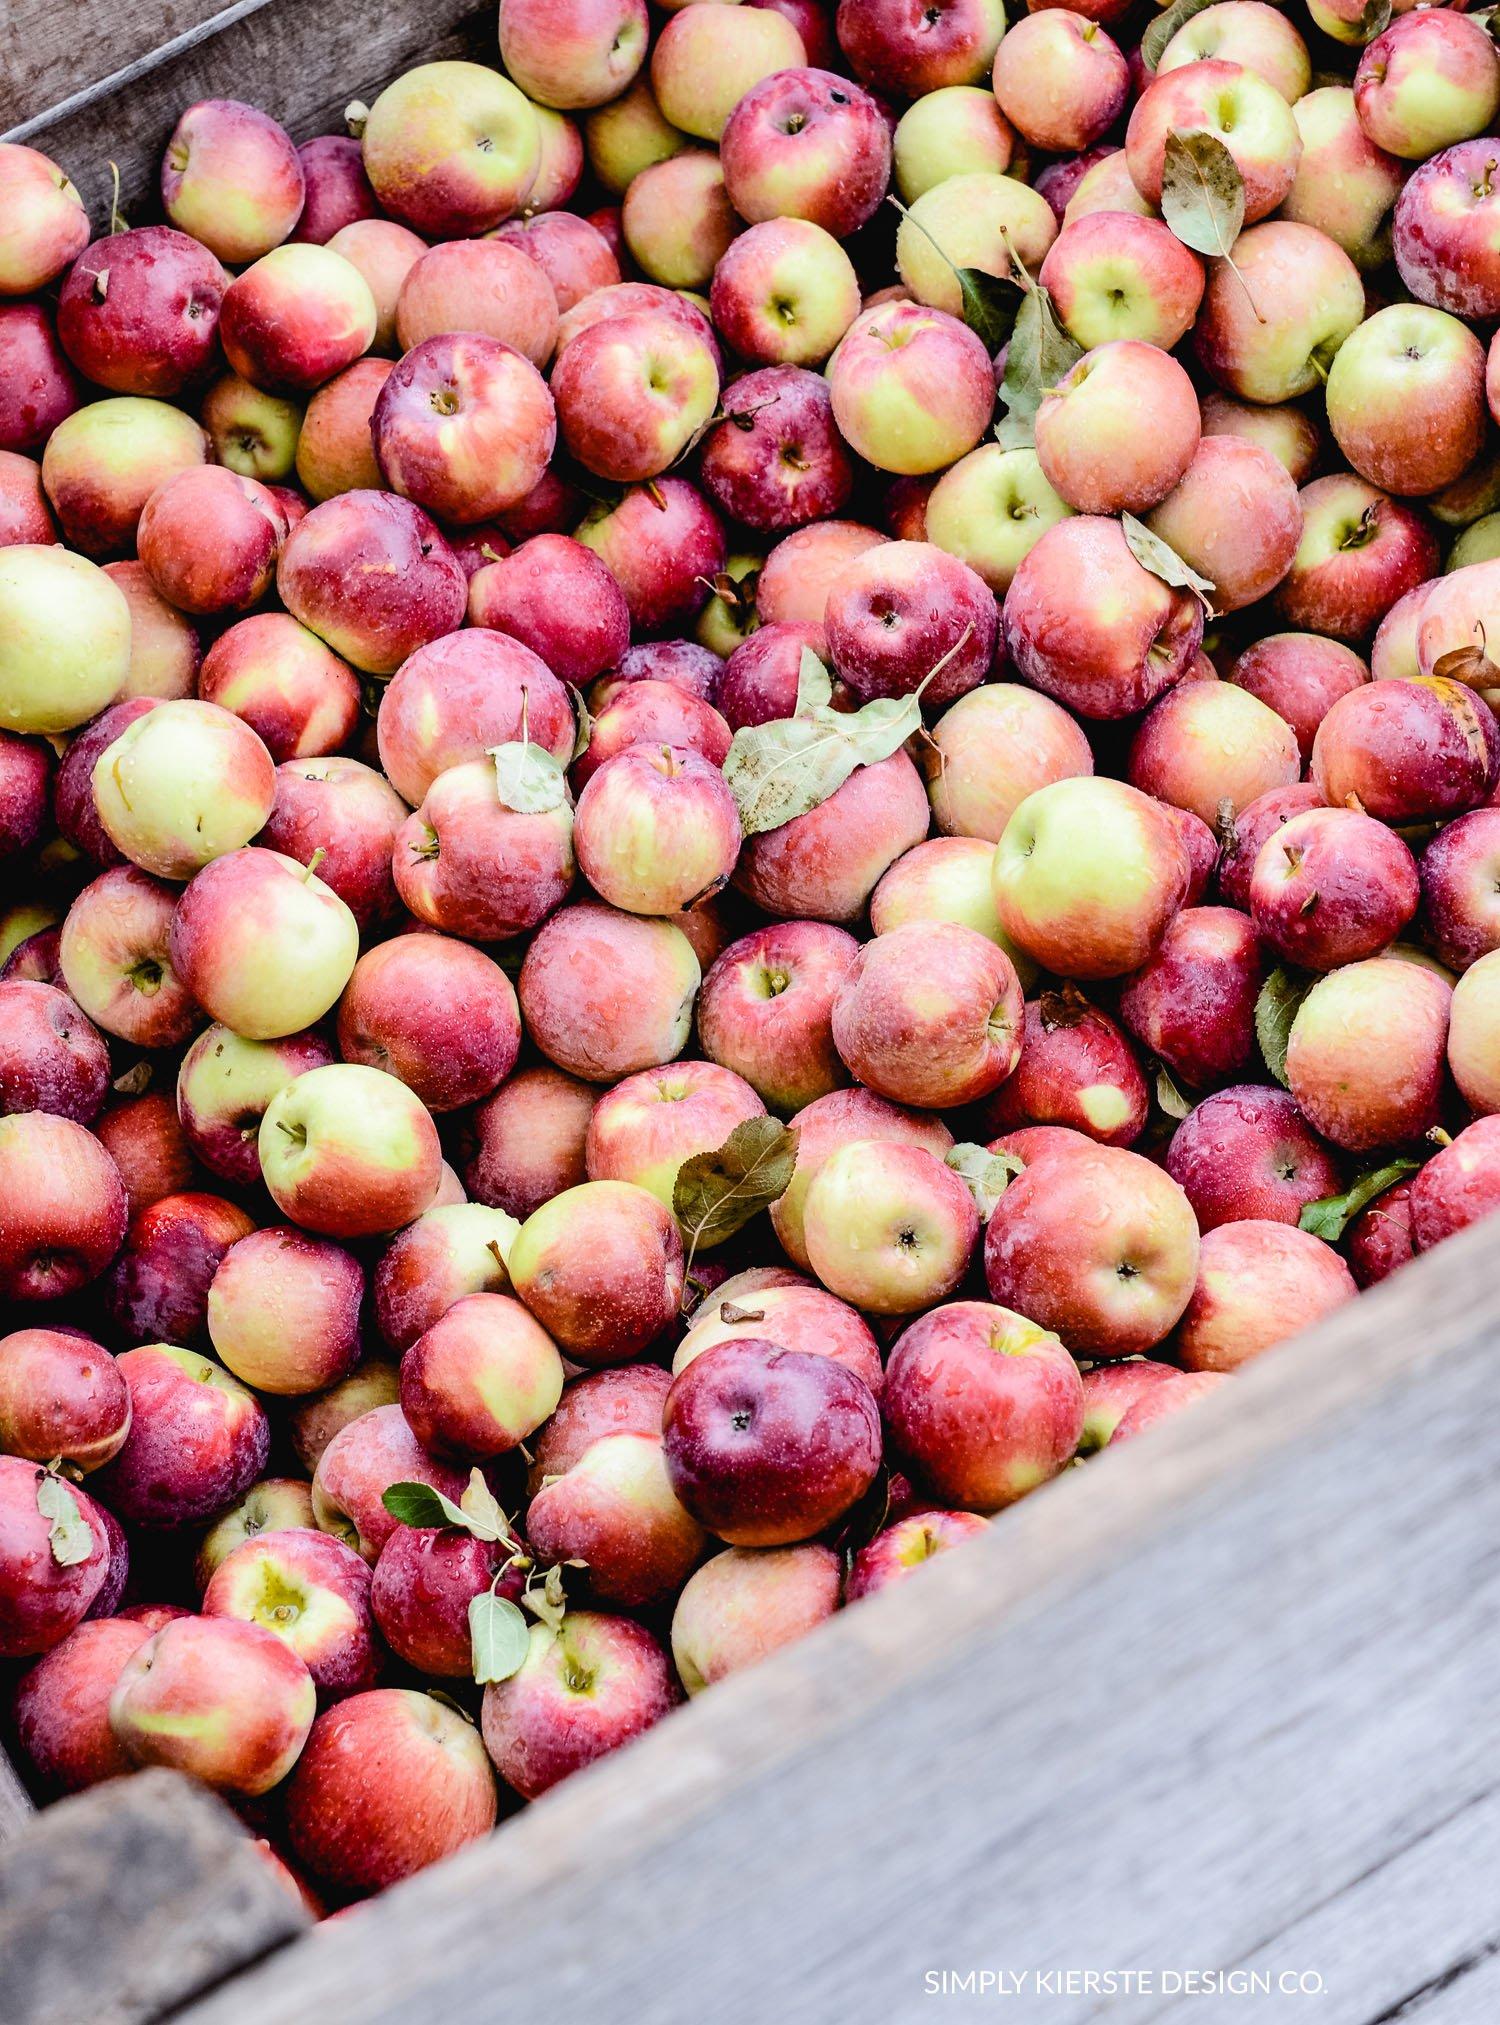 Apple Picking | Apple Farm | Fall Family Tradition | simplykierste.com